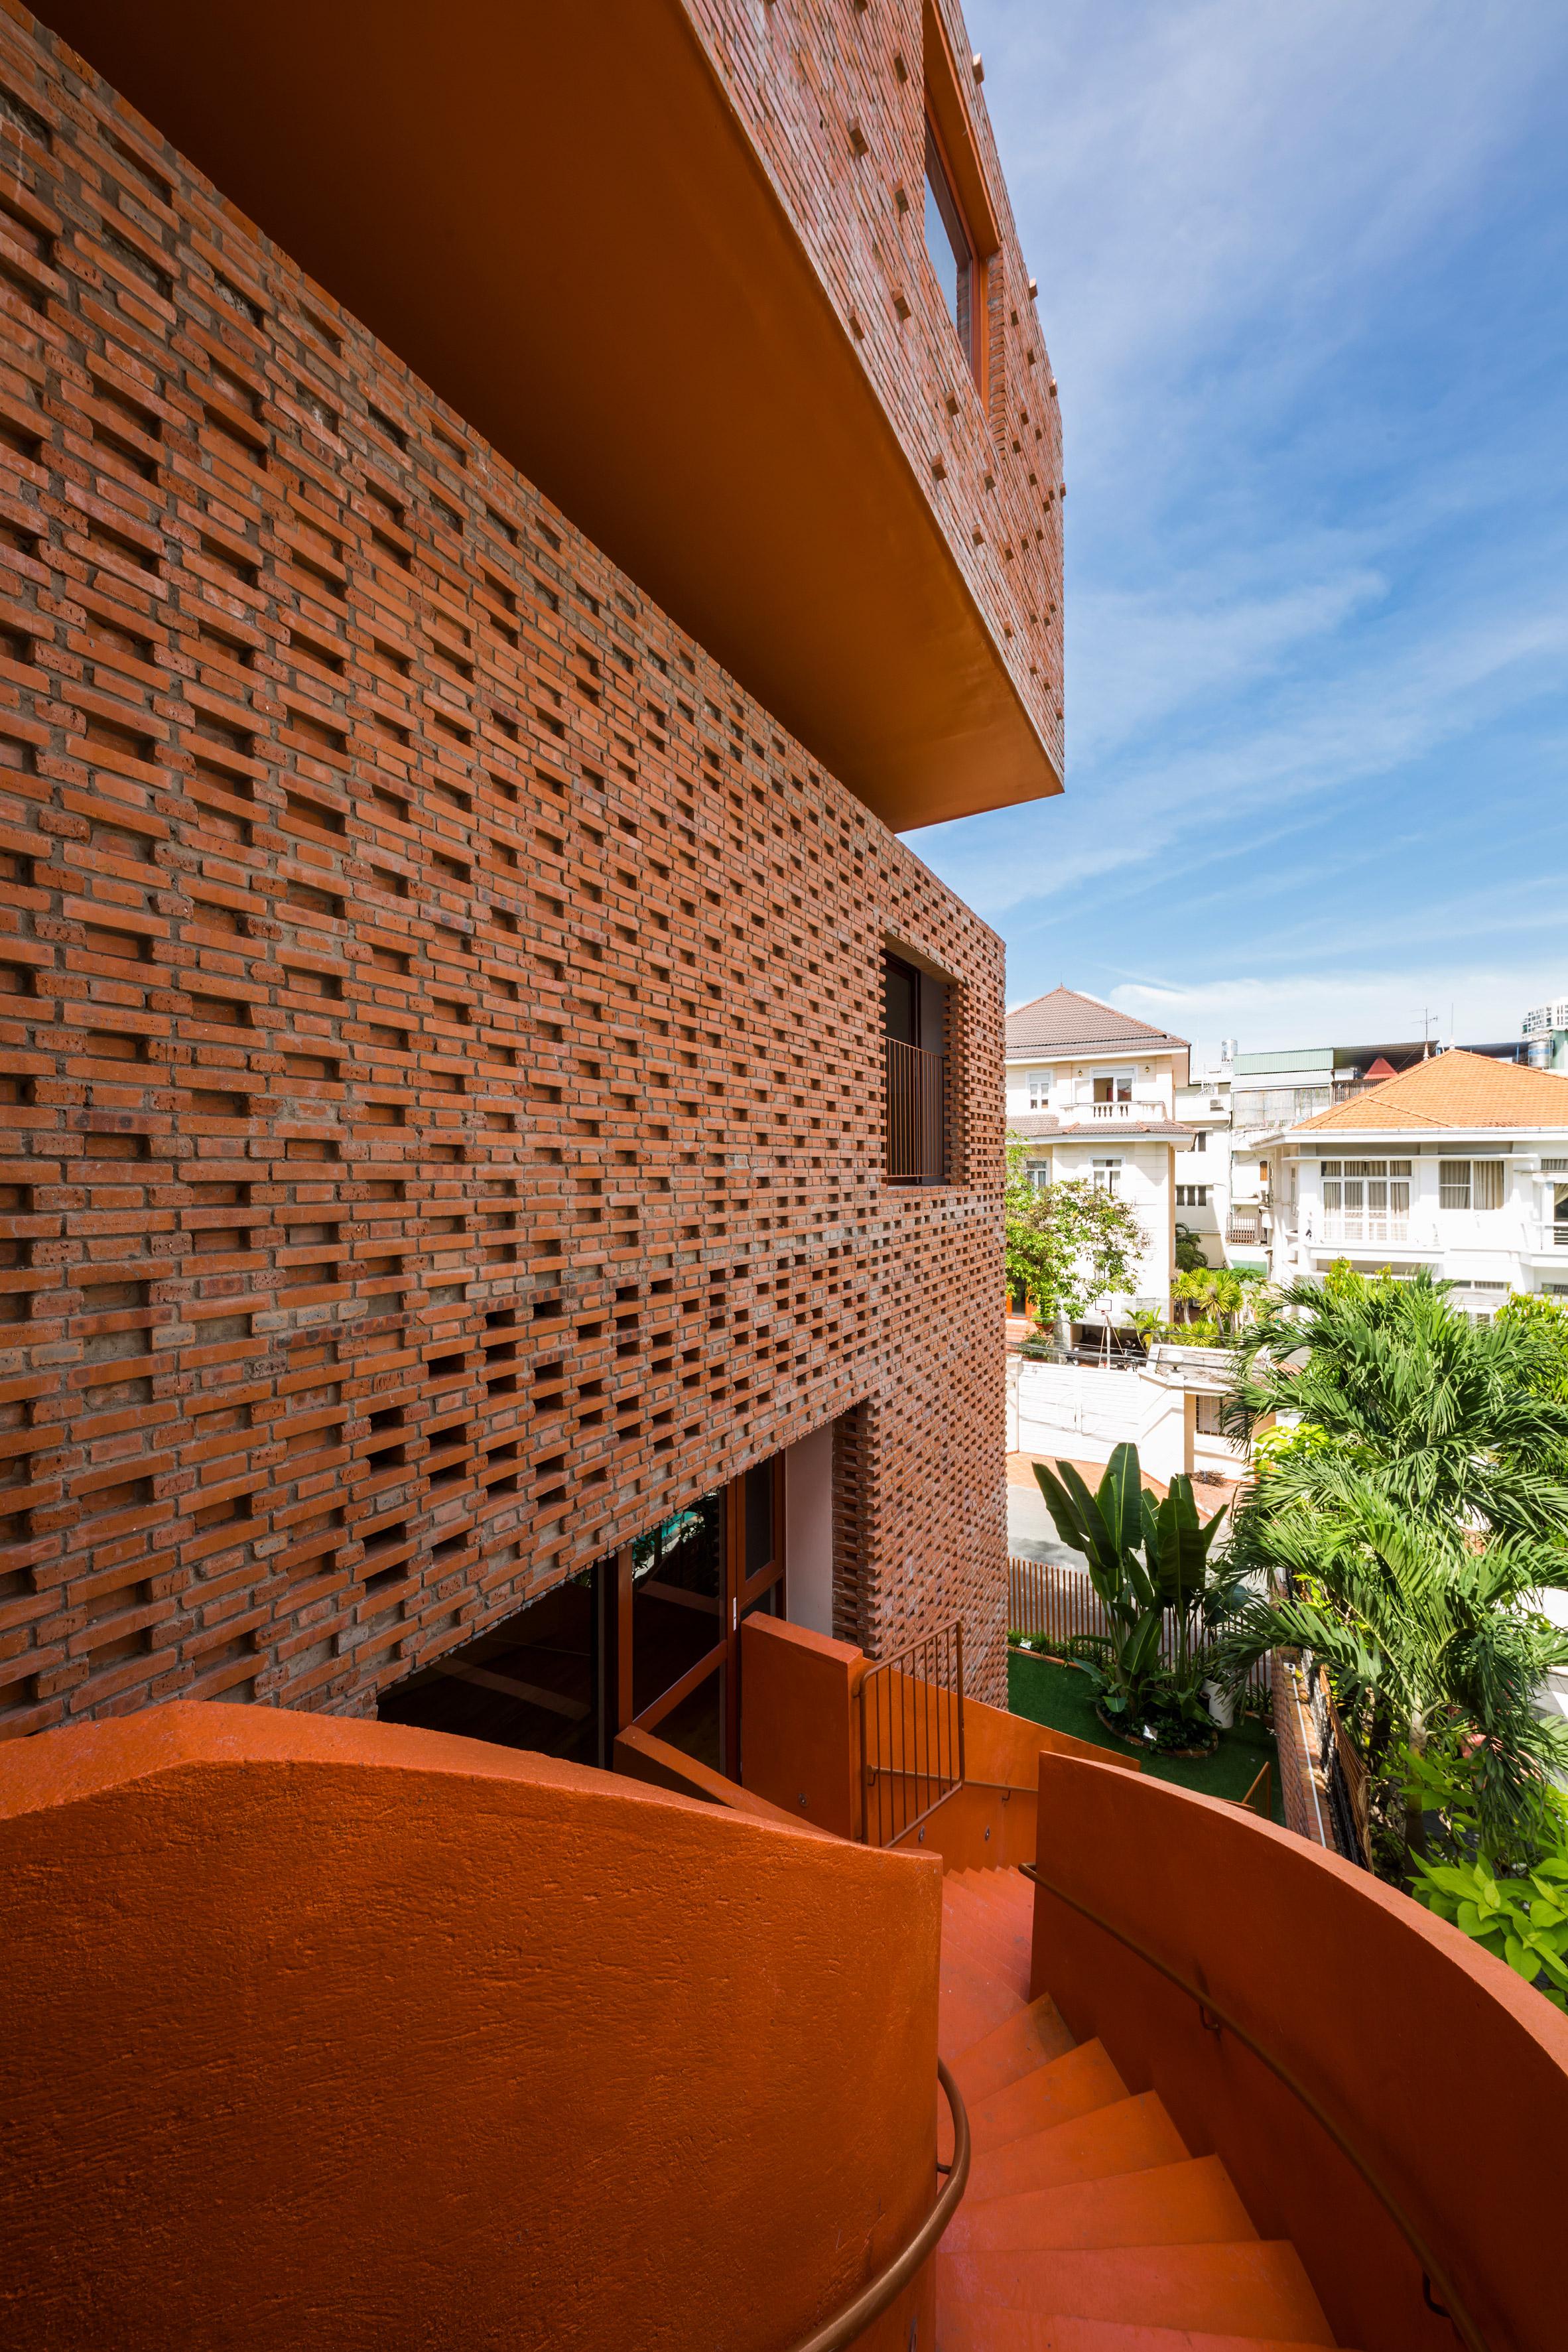 chuon-chuon-kim-kindergarten-kientruc-o-architecture-education-vietnam_dezeen_2364_col_12.jpg